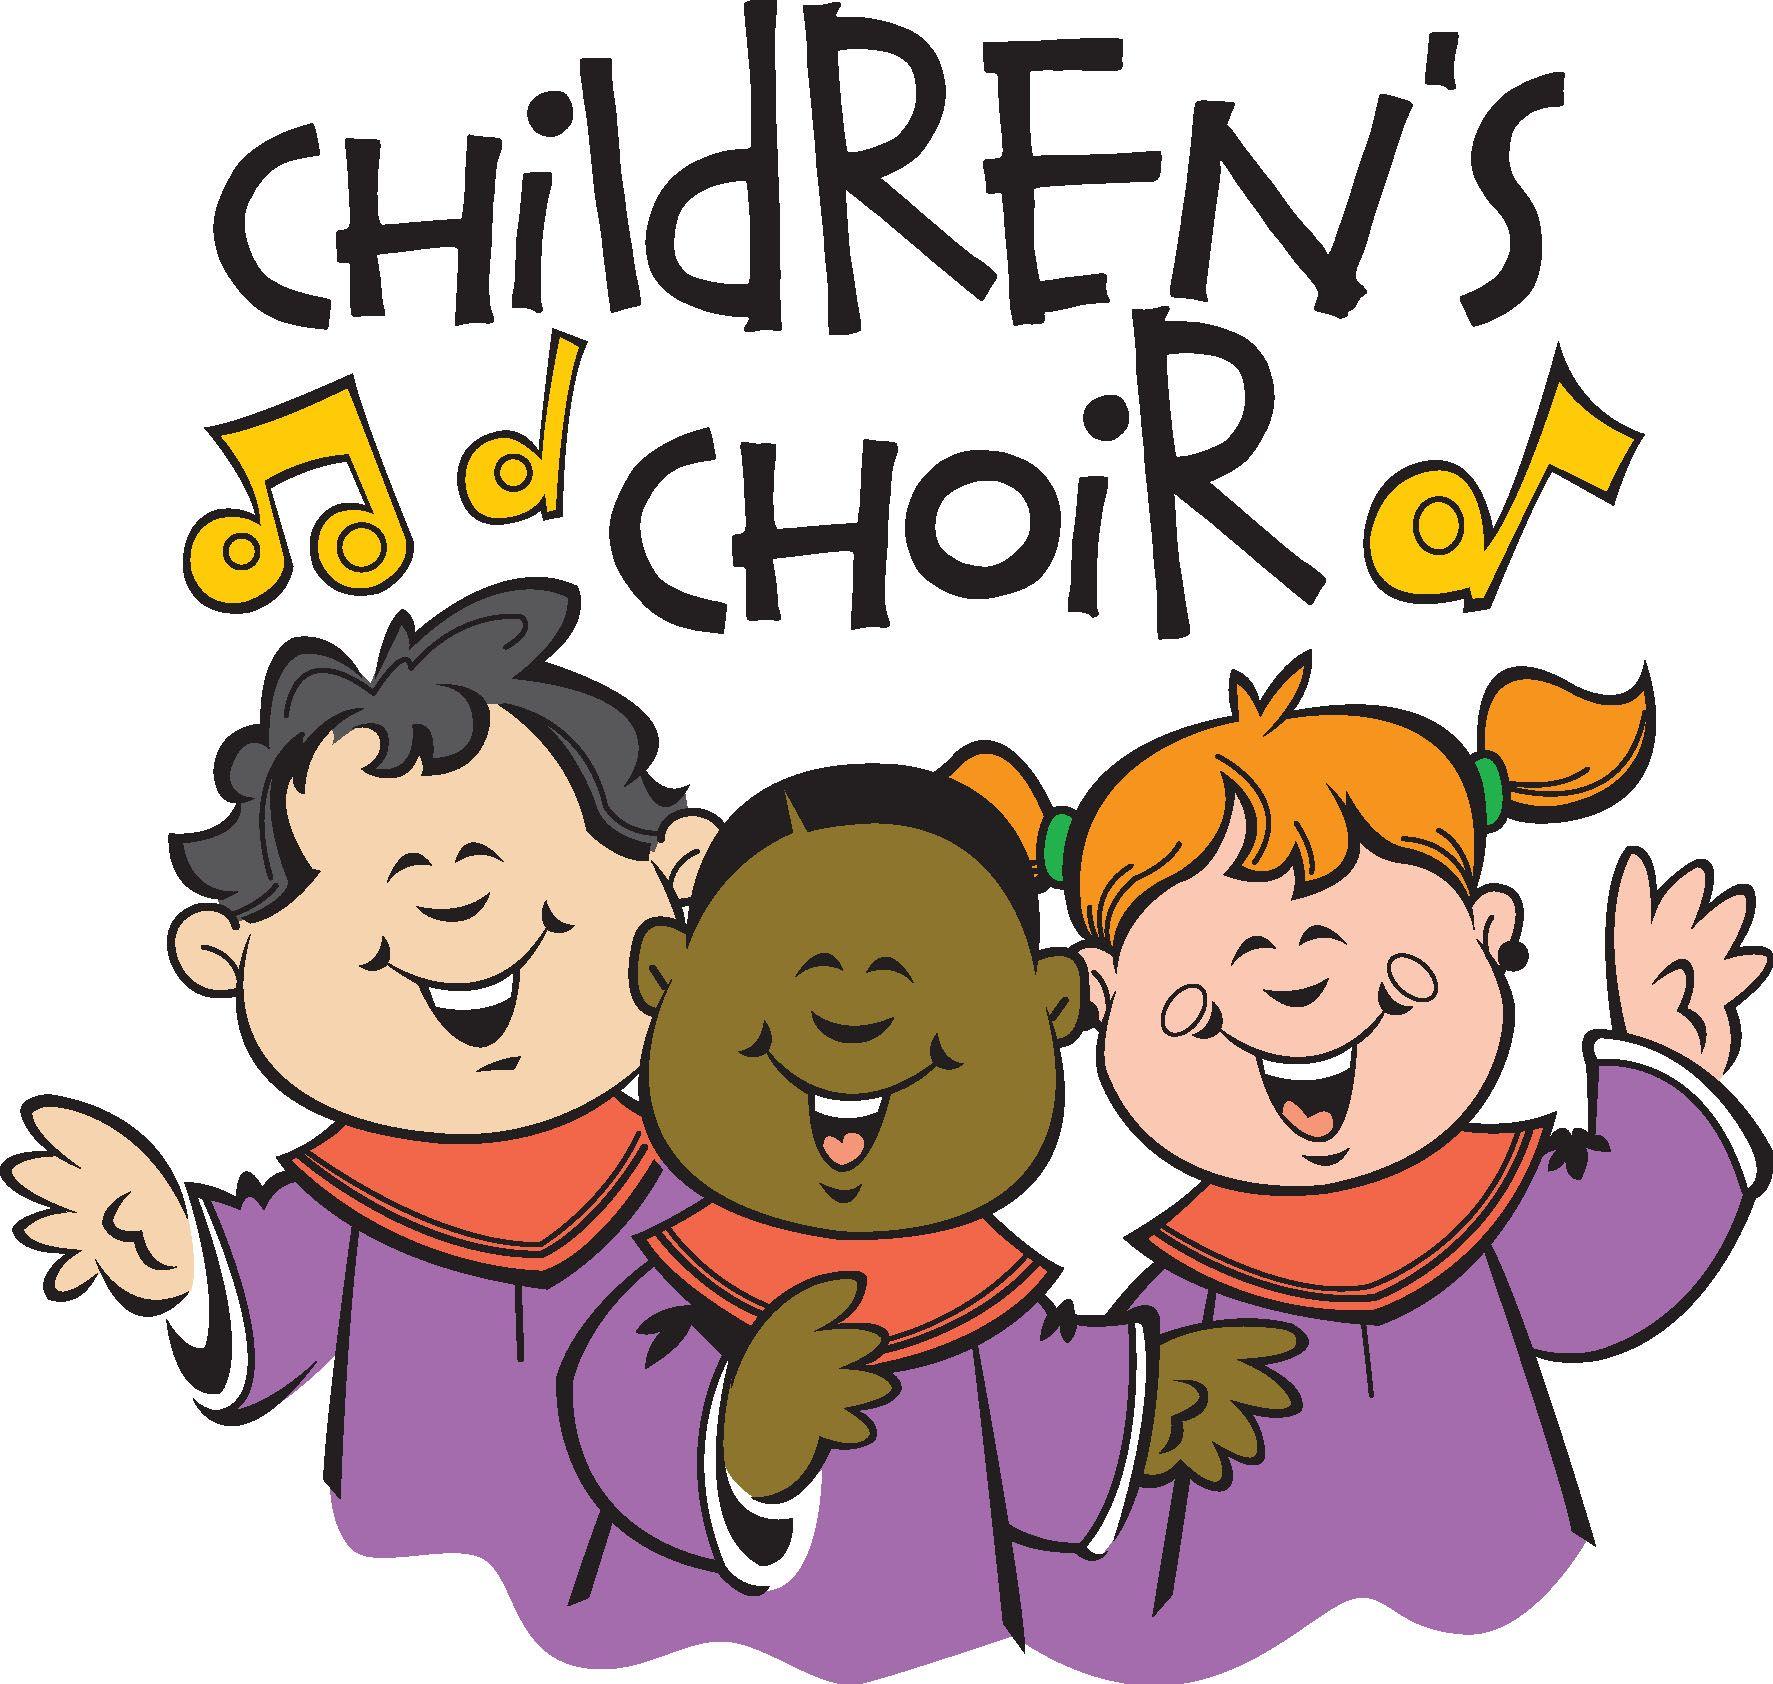 Childrens choir clipart 3 » Clipart Station.